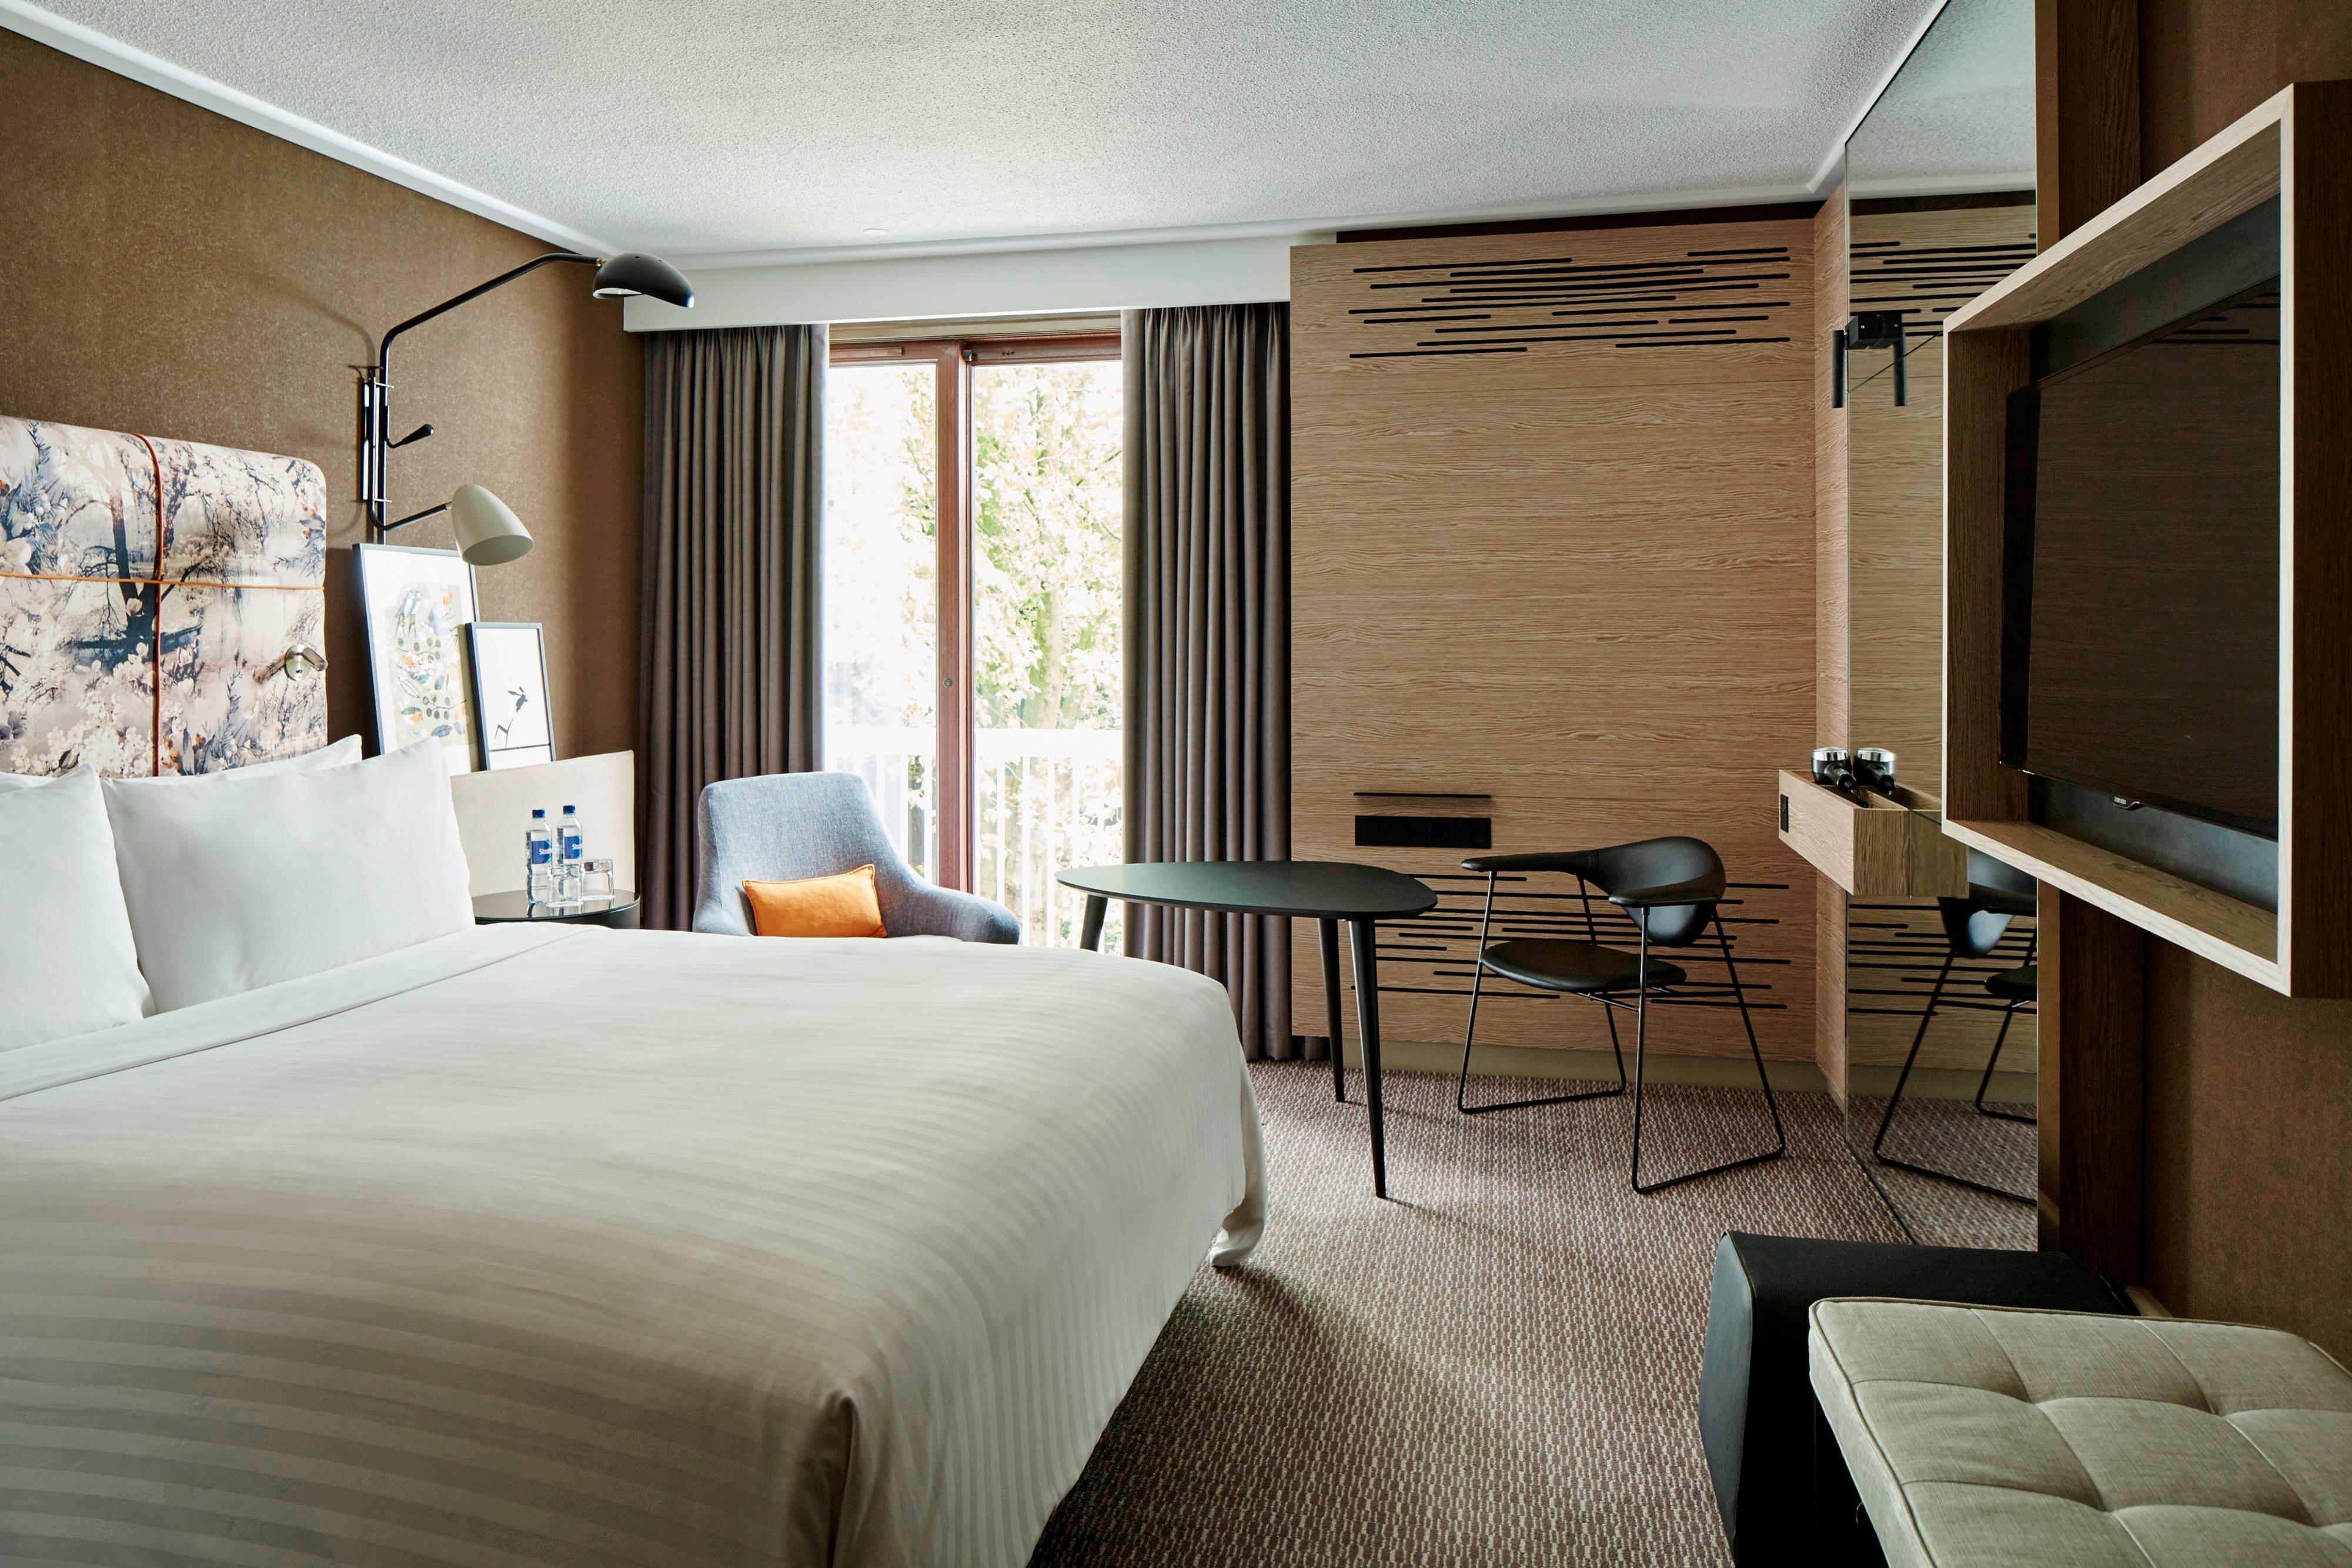 Chambre Deluxe avec lit king size